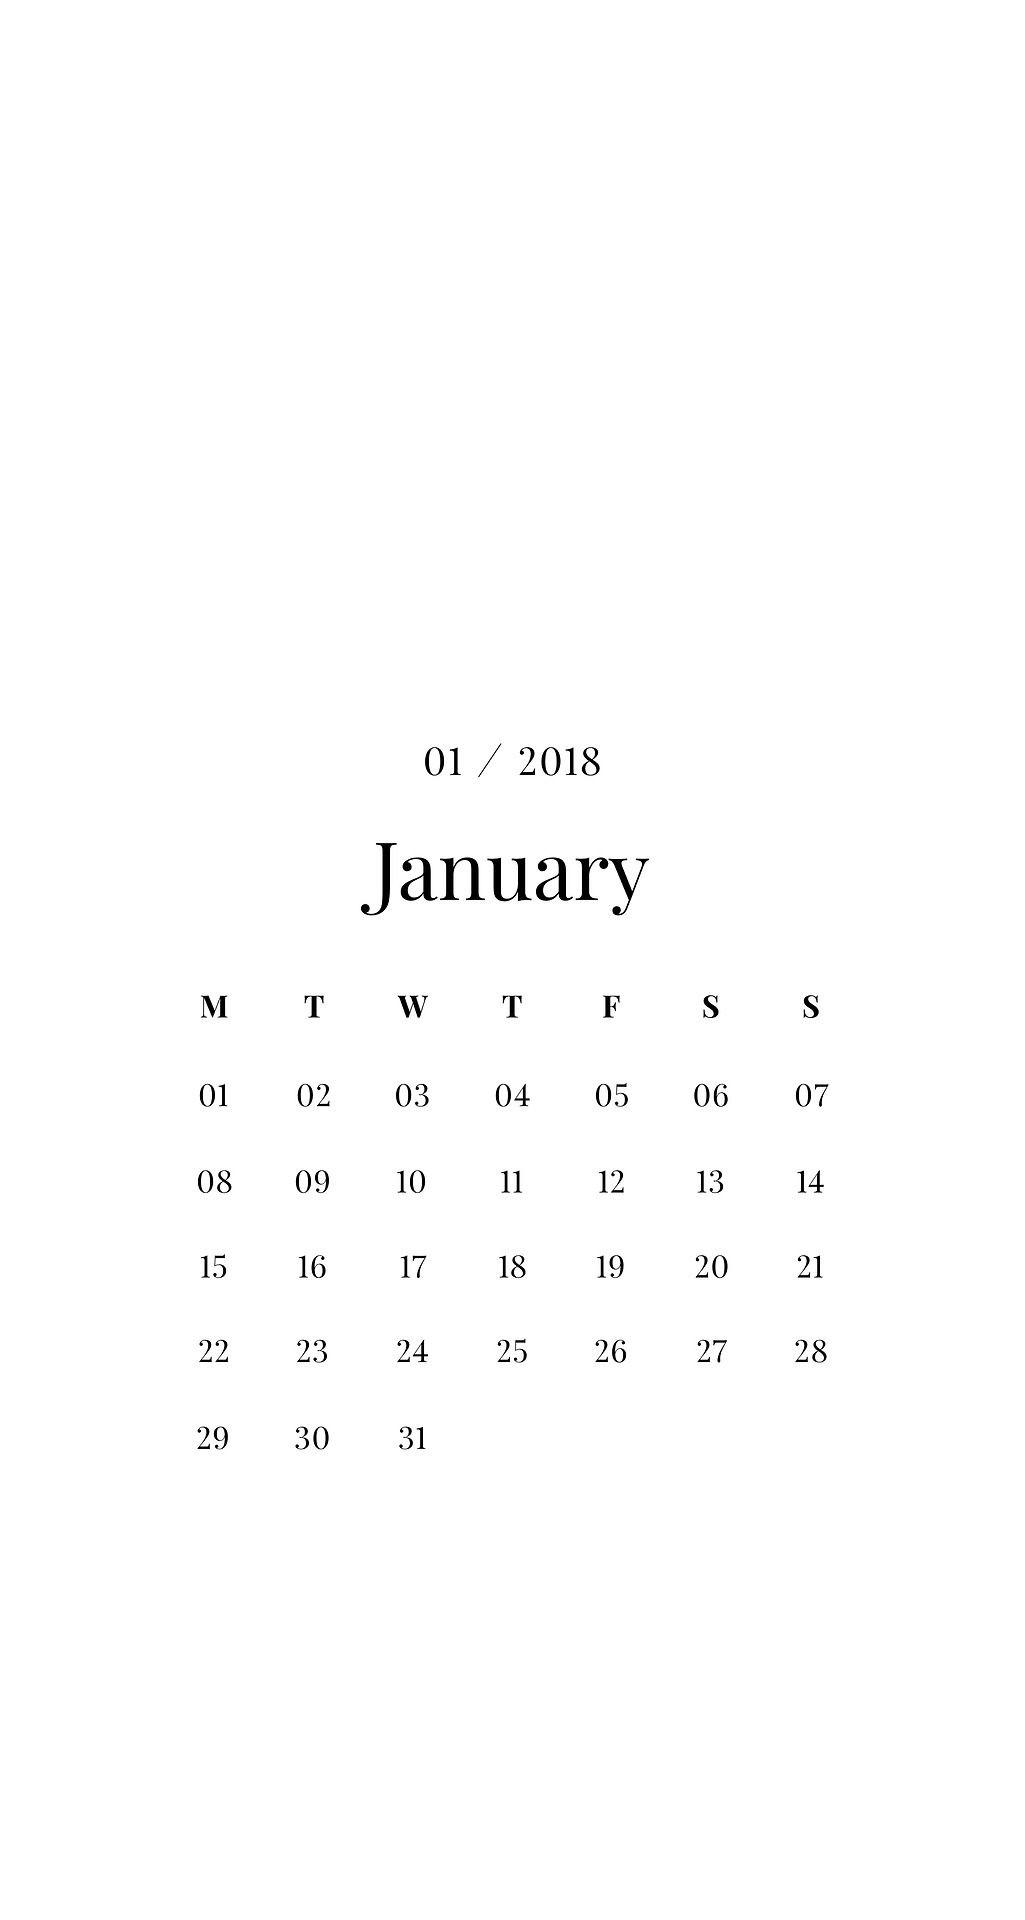 Emmas Studyblr January Minimalist Calendar Phone IPhone Wallpaper Background